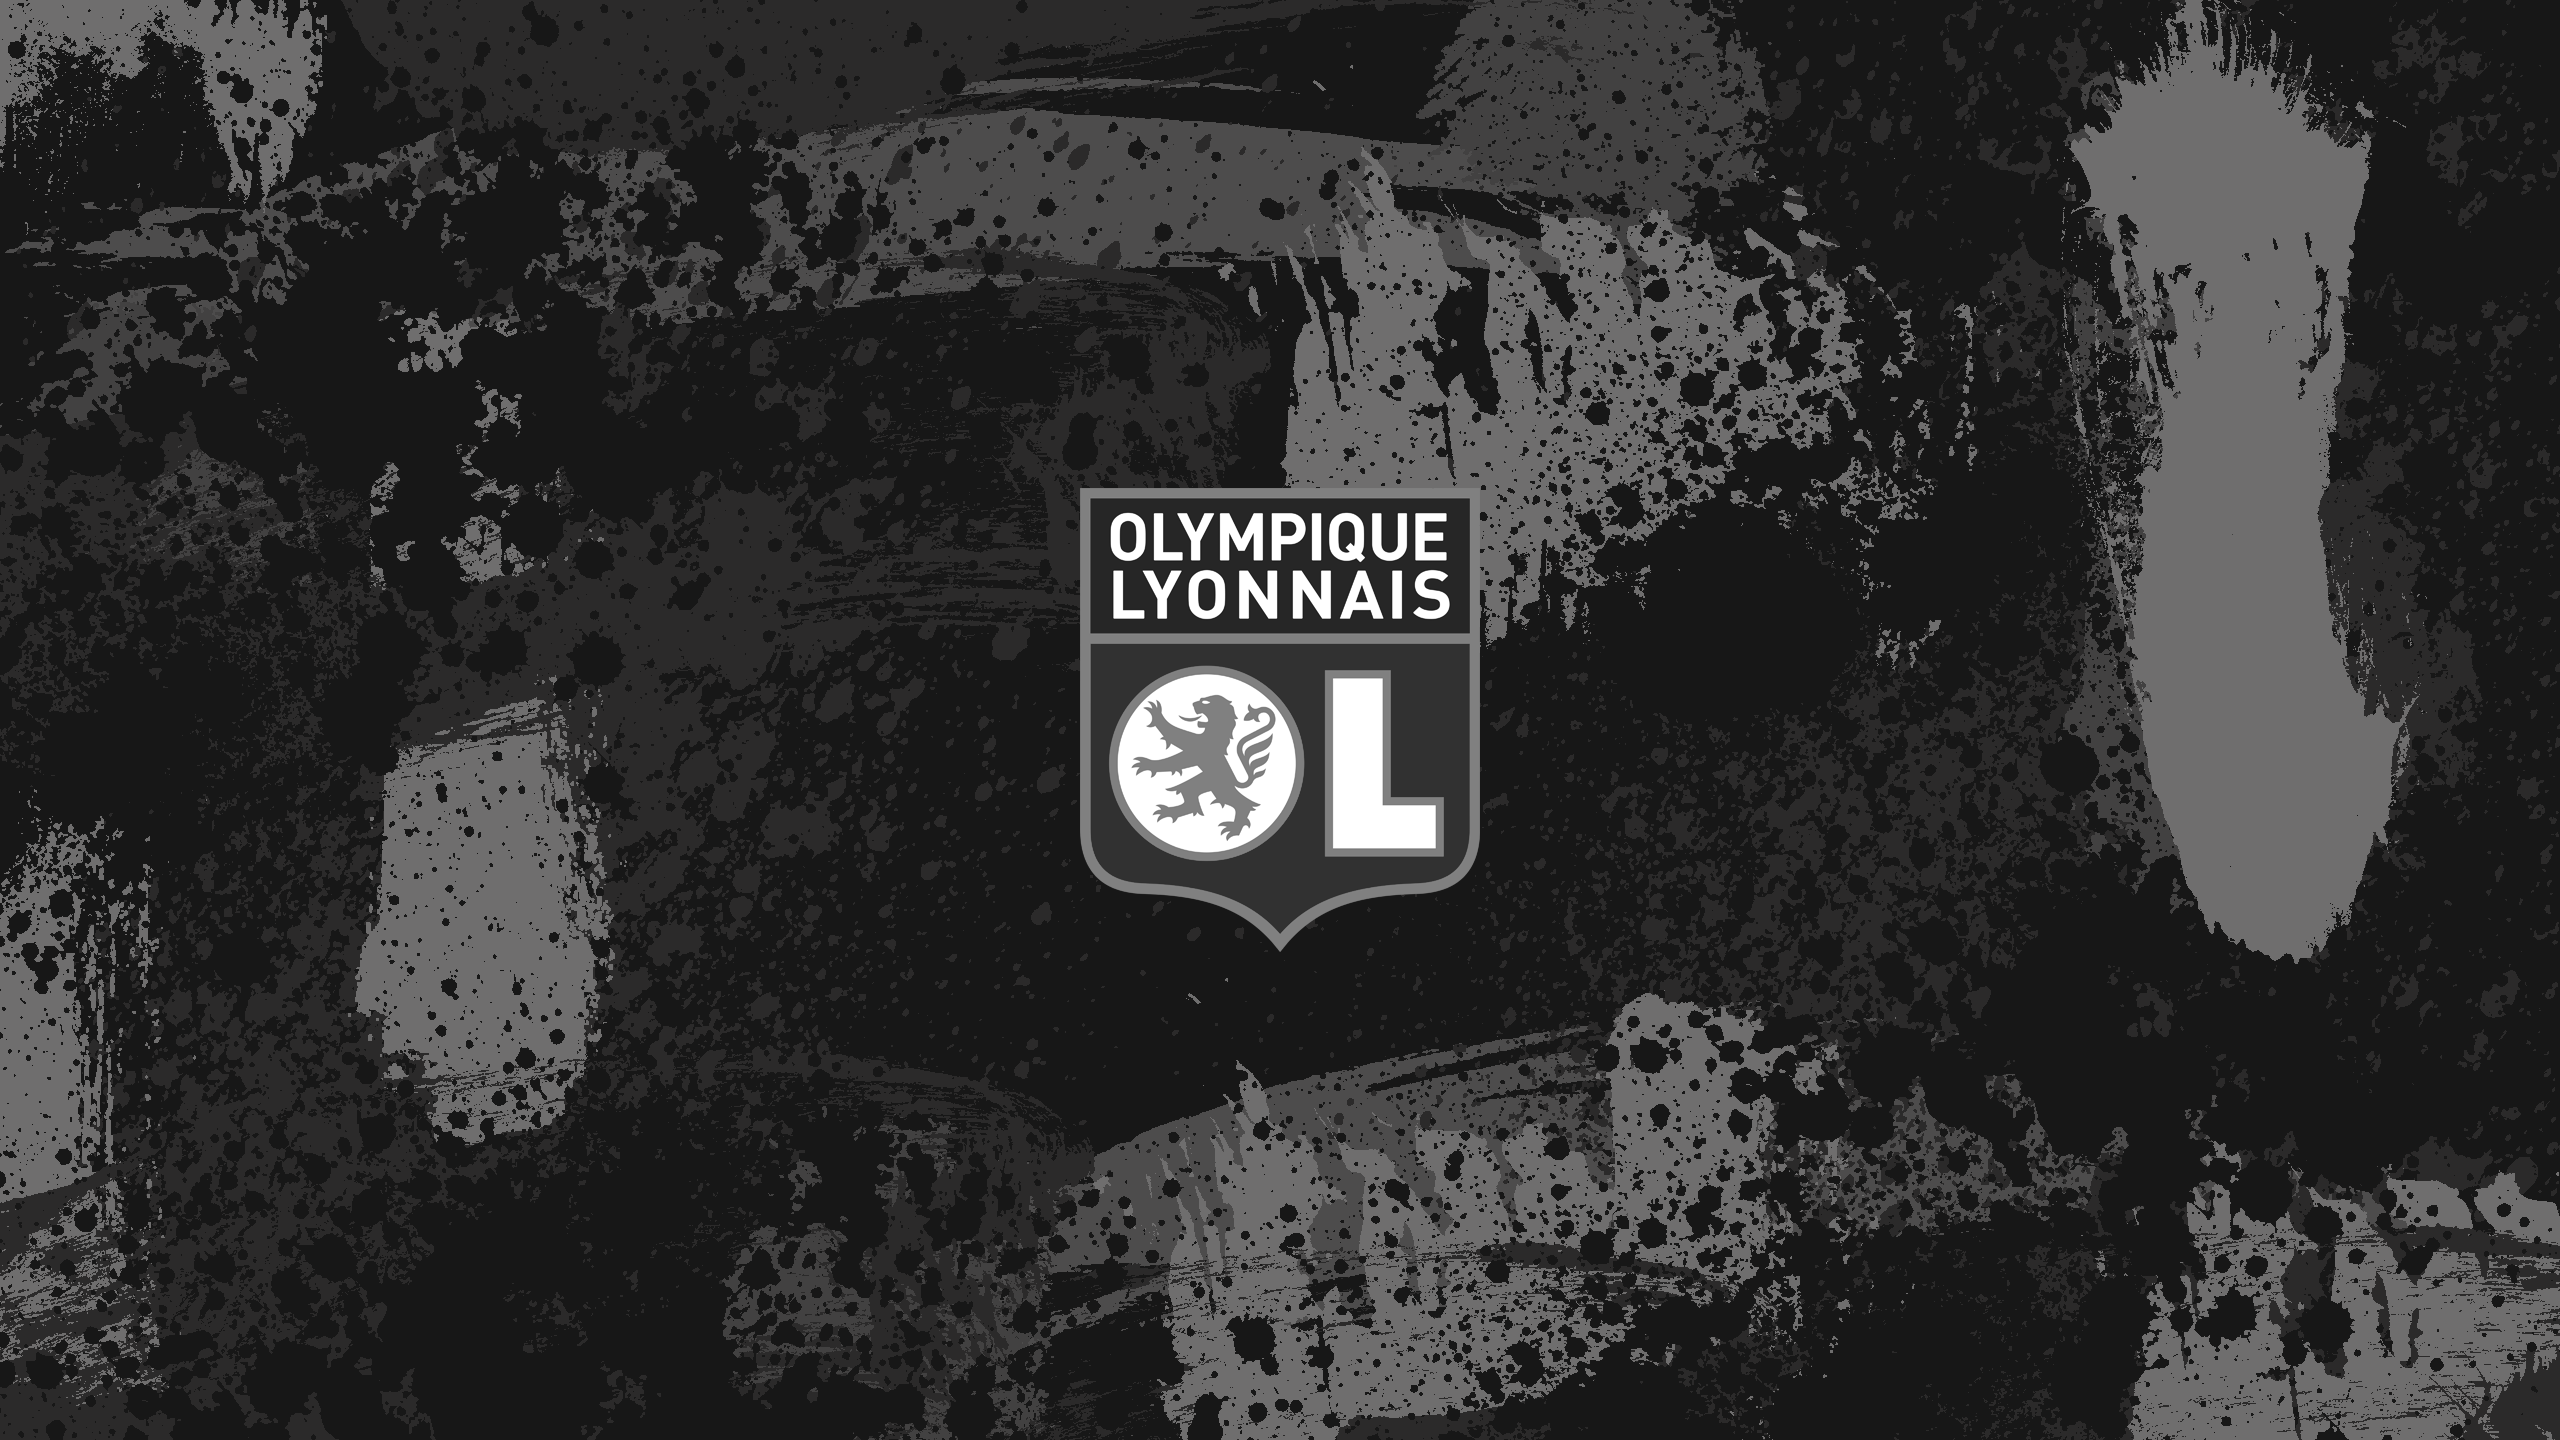 Lyon [Olympique Lyonnais] (Third)